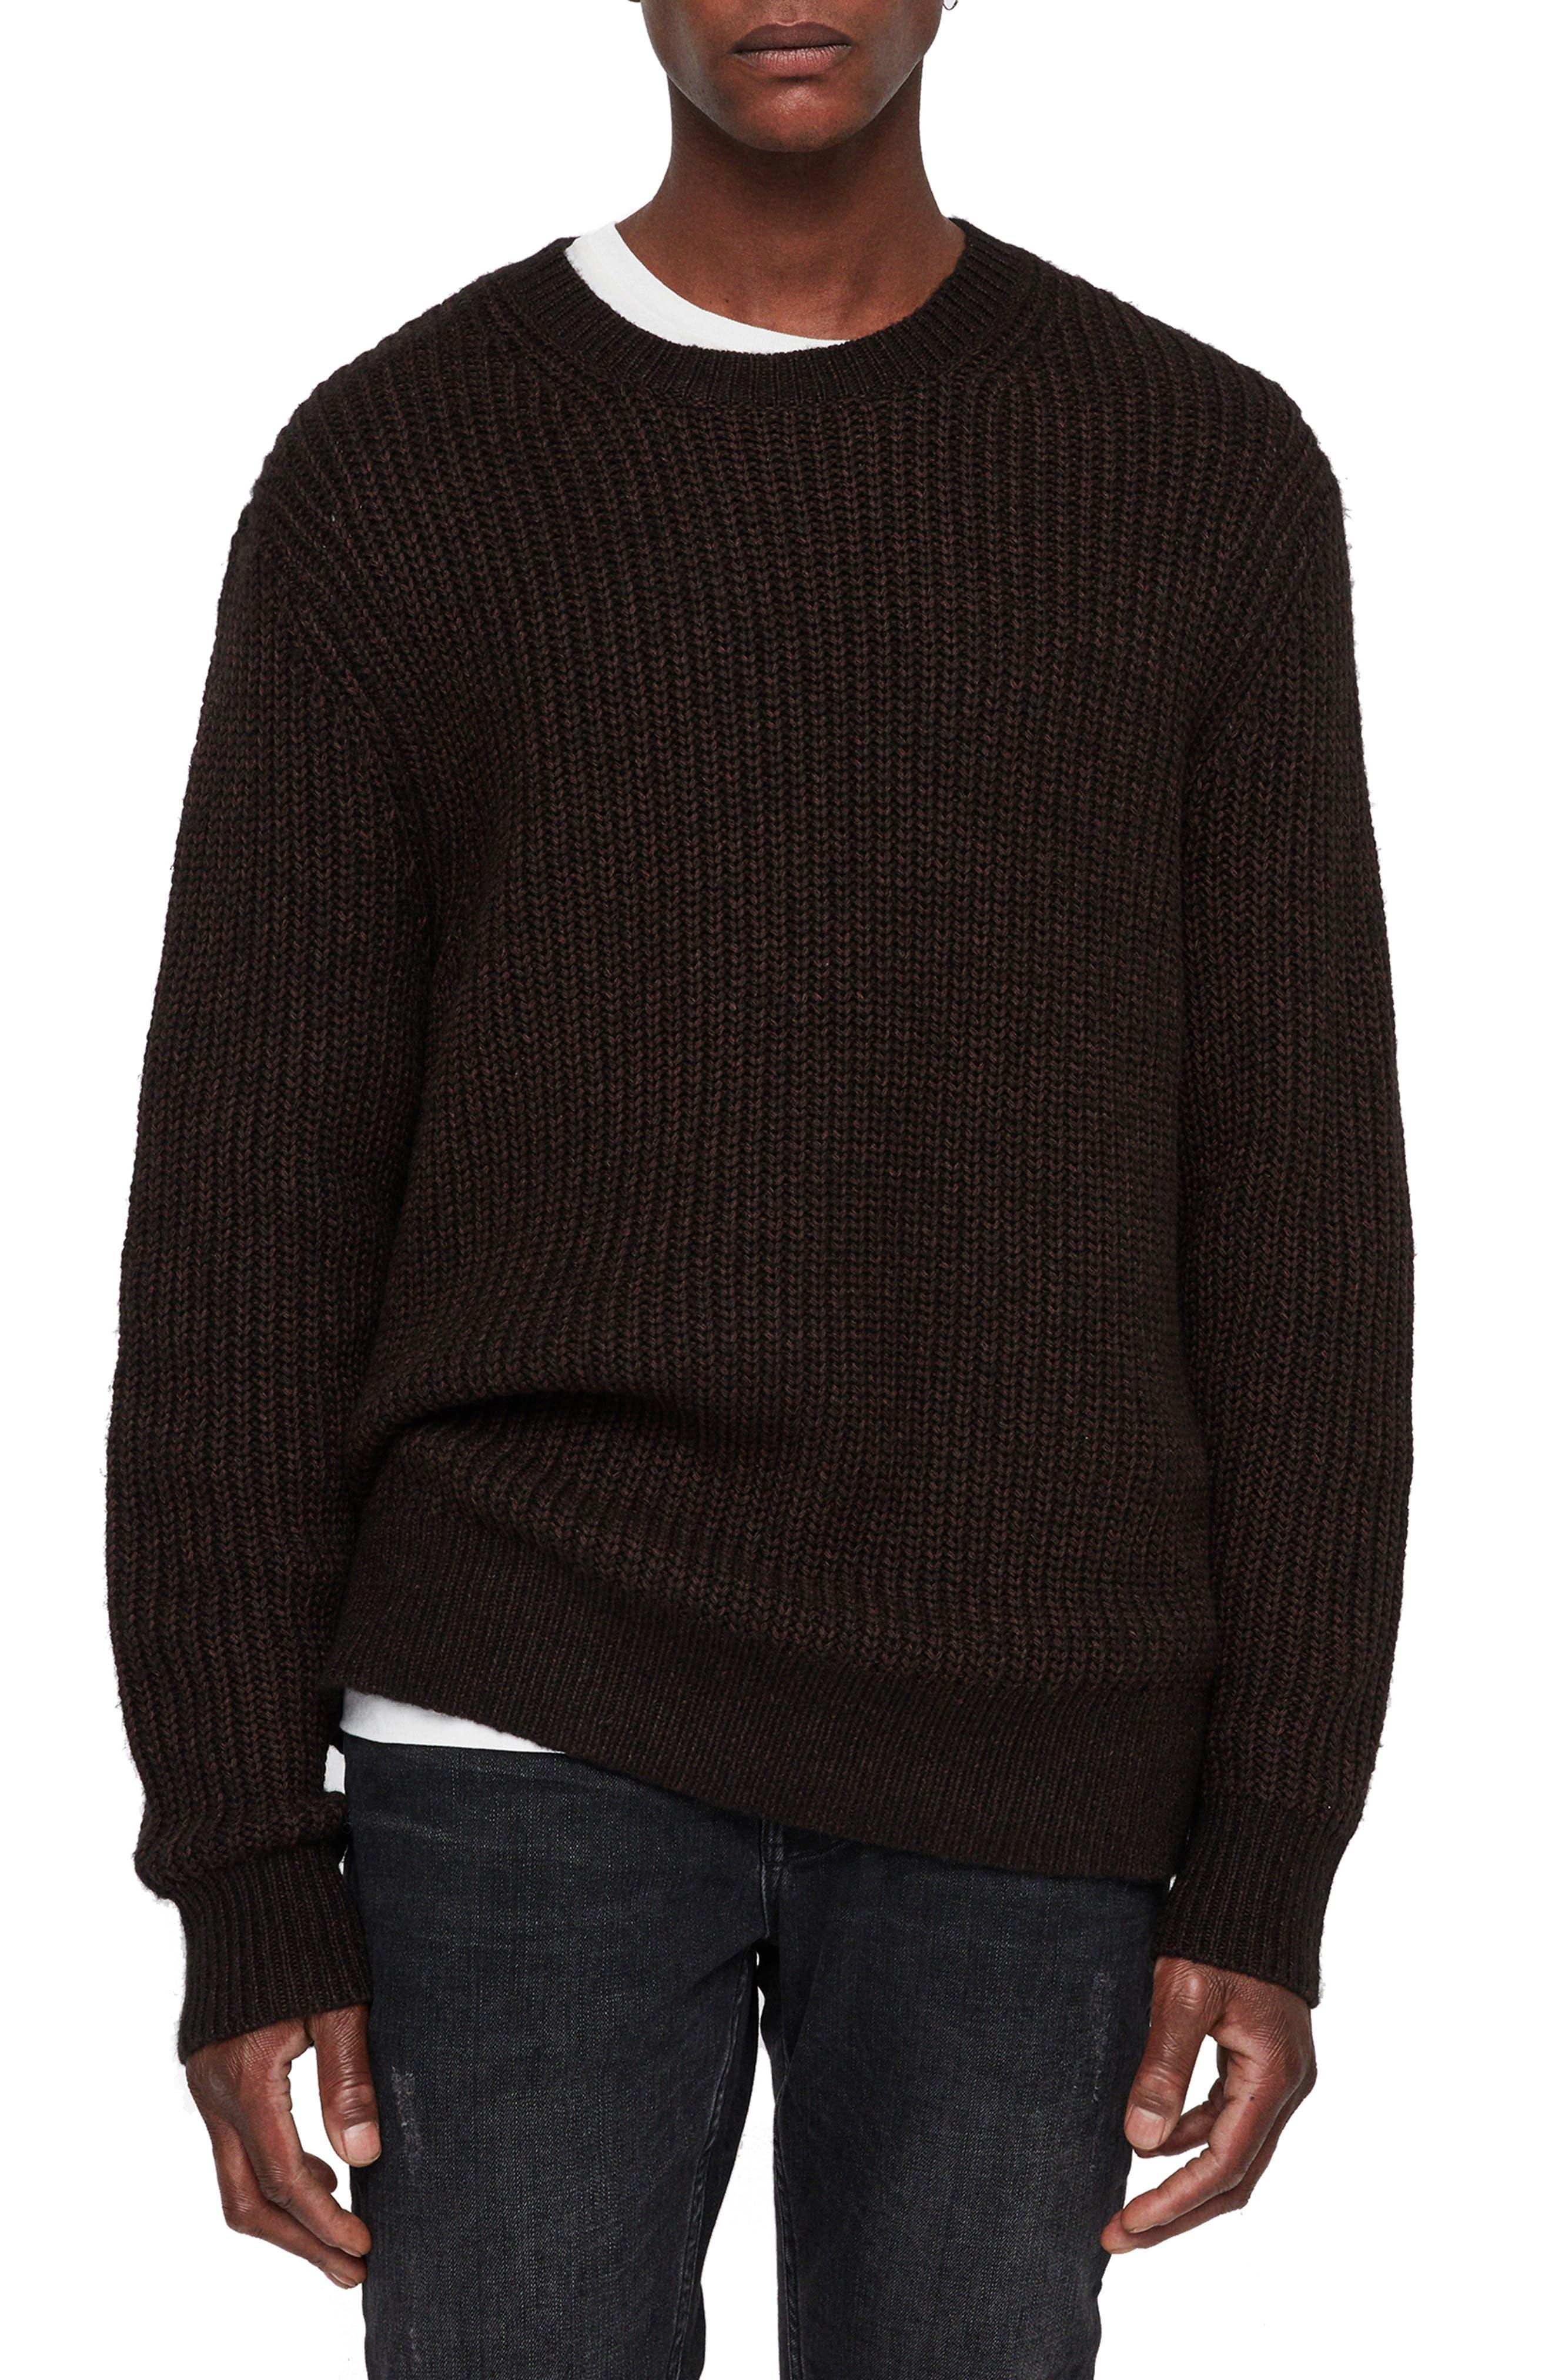 Tilman Regular Fit Sweater,                         Main,                         color, 001